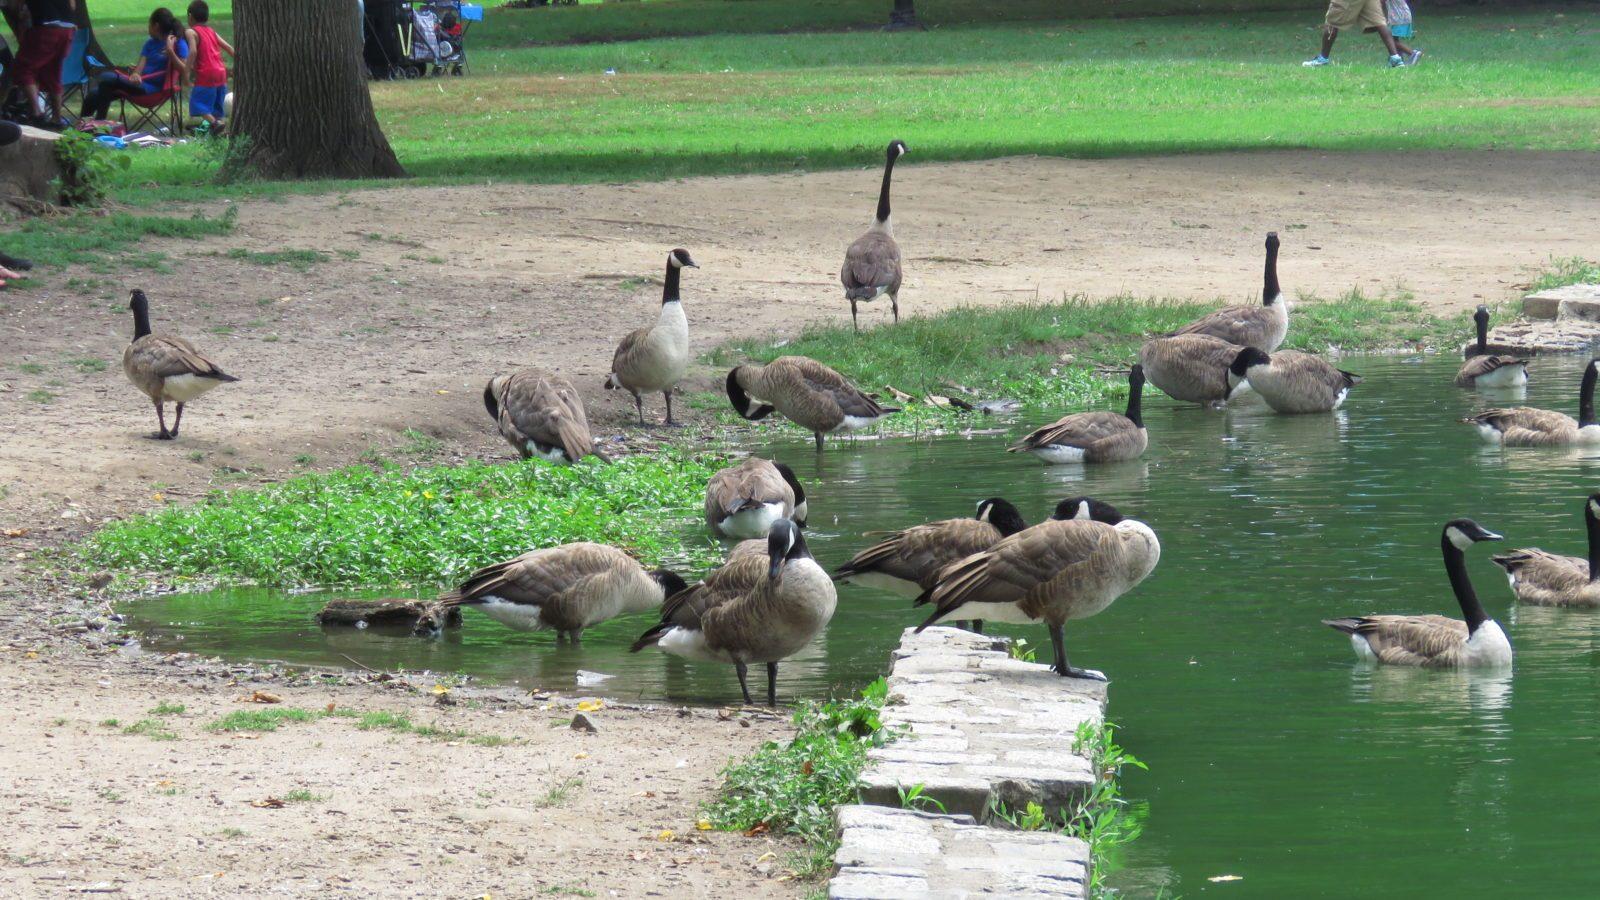 Nardio Explores Prospect Park 033